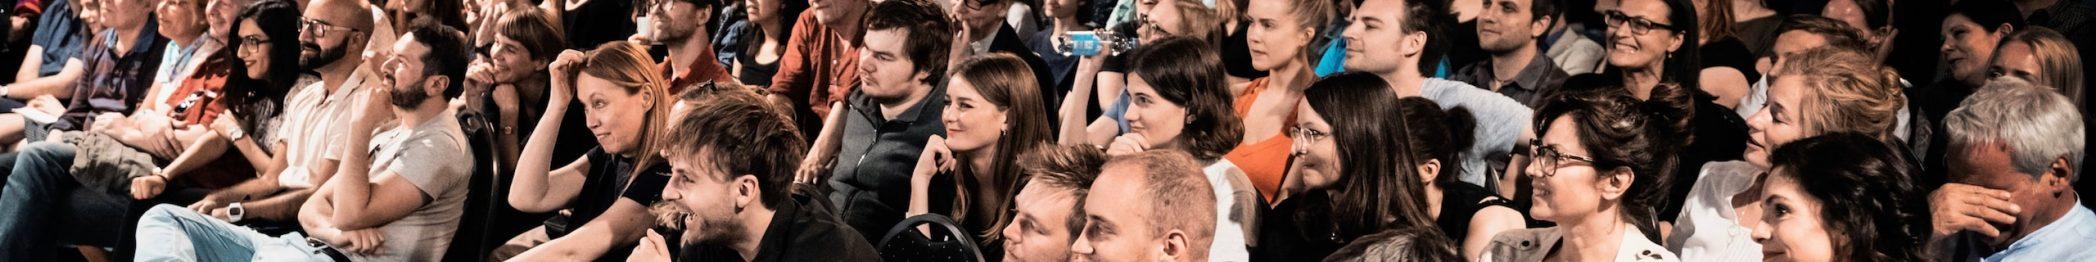 LOLA Festival 2018 Panel Publik